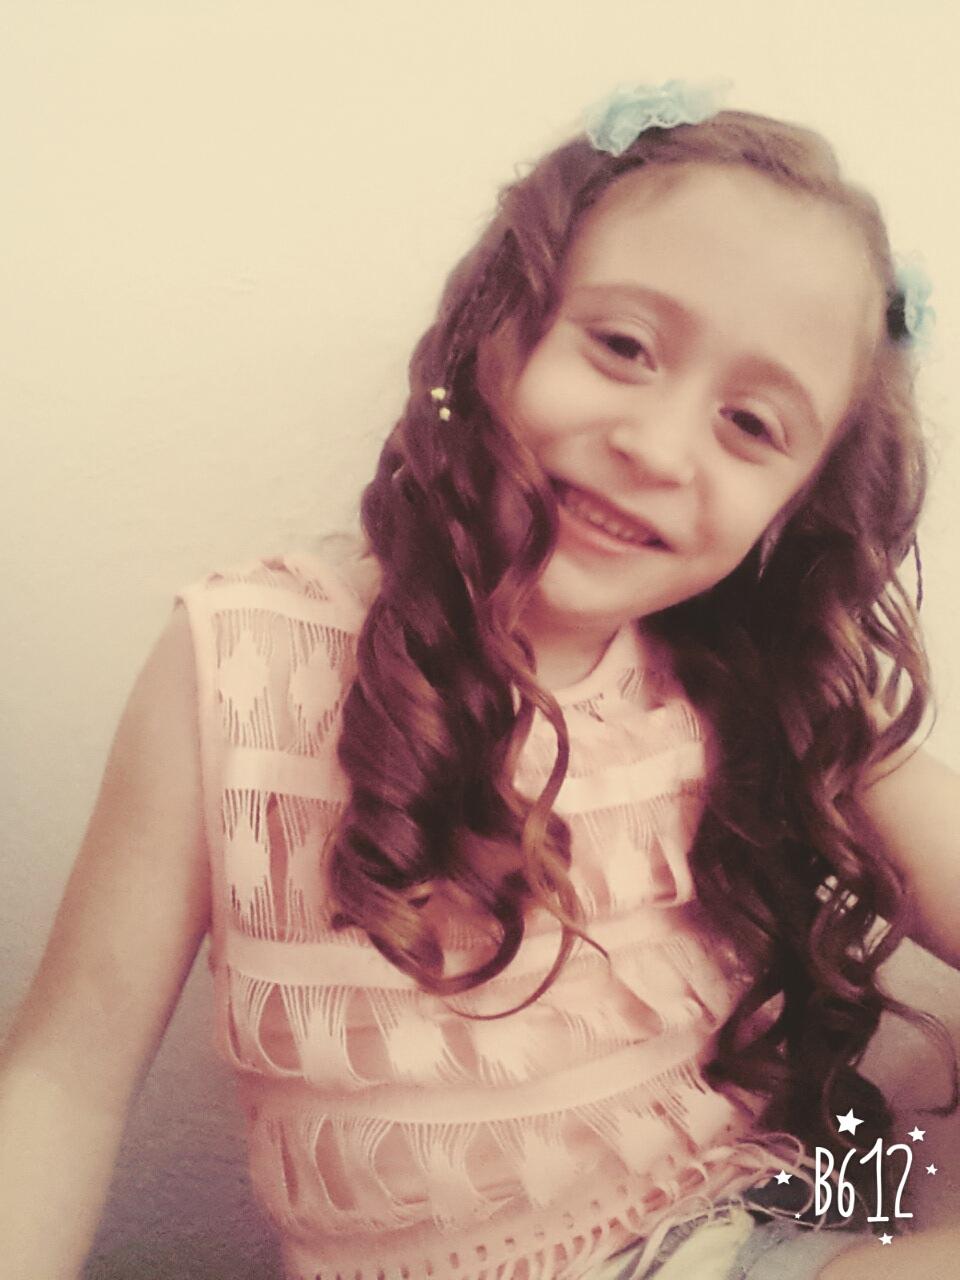 Doğum günün kutlu olsun Belinay Aktay